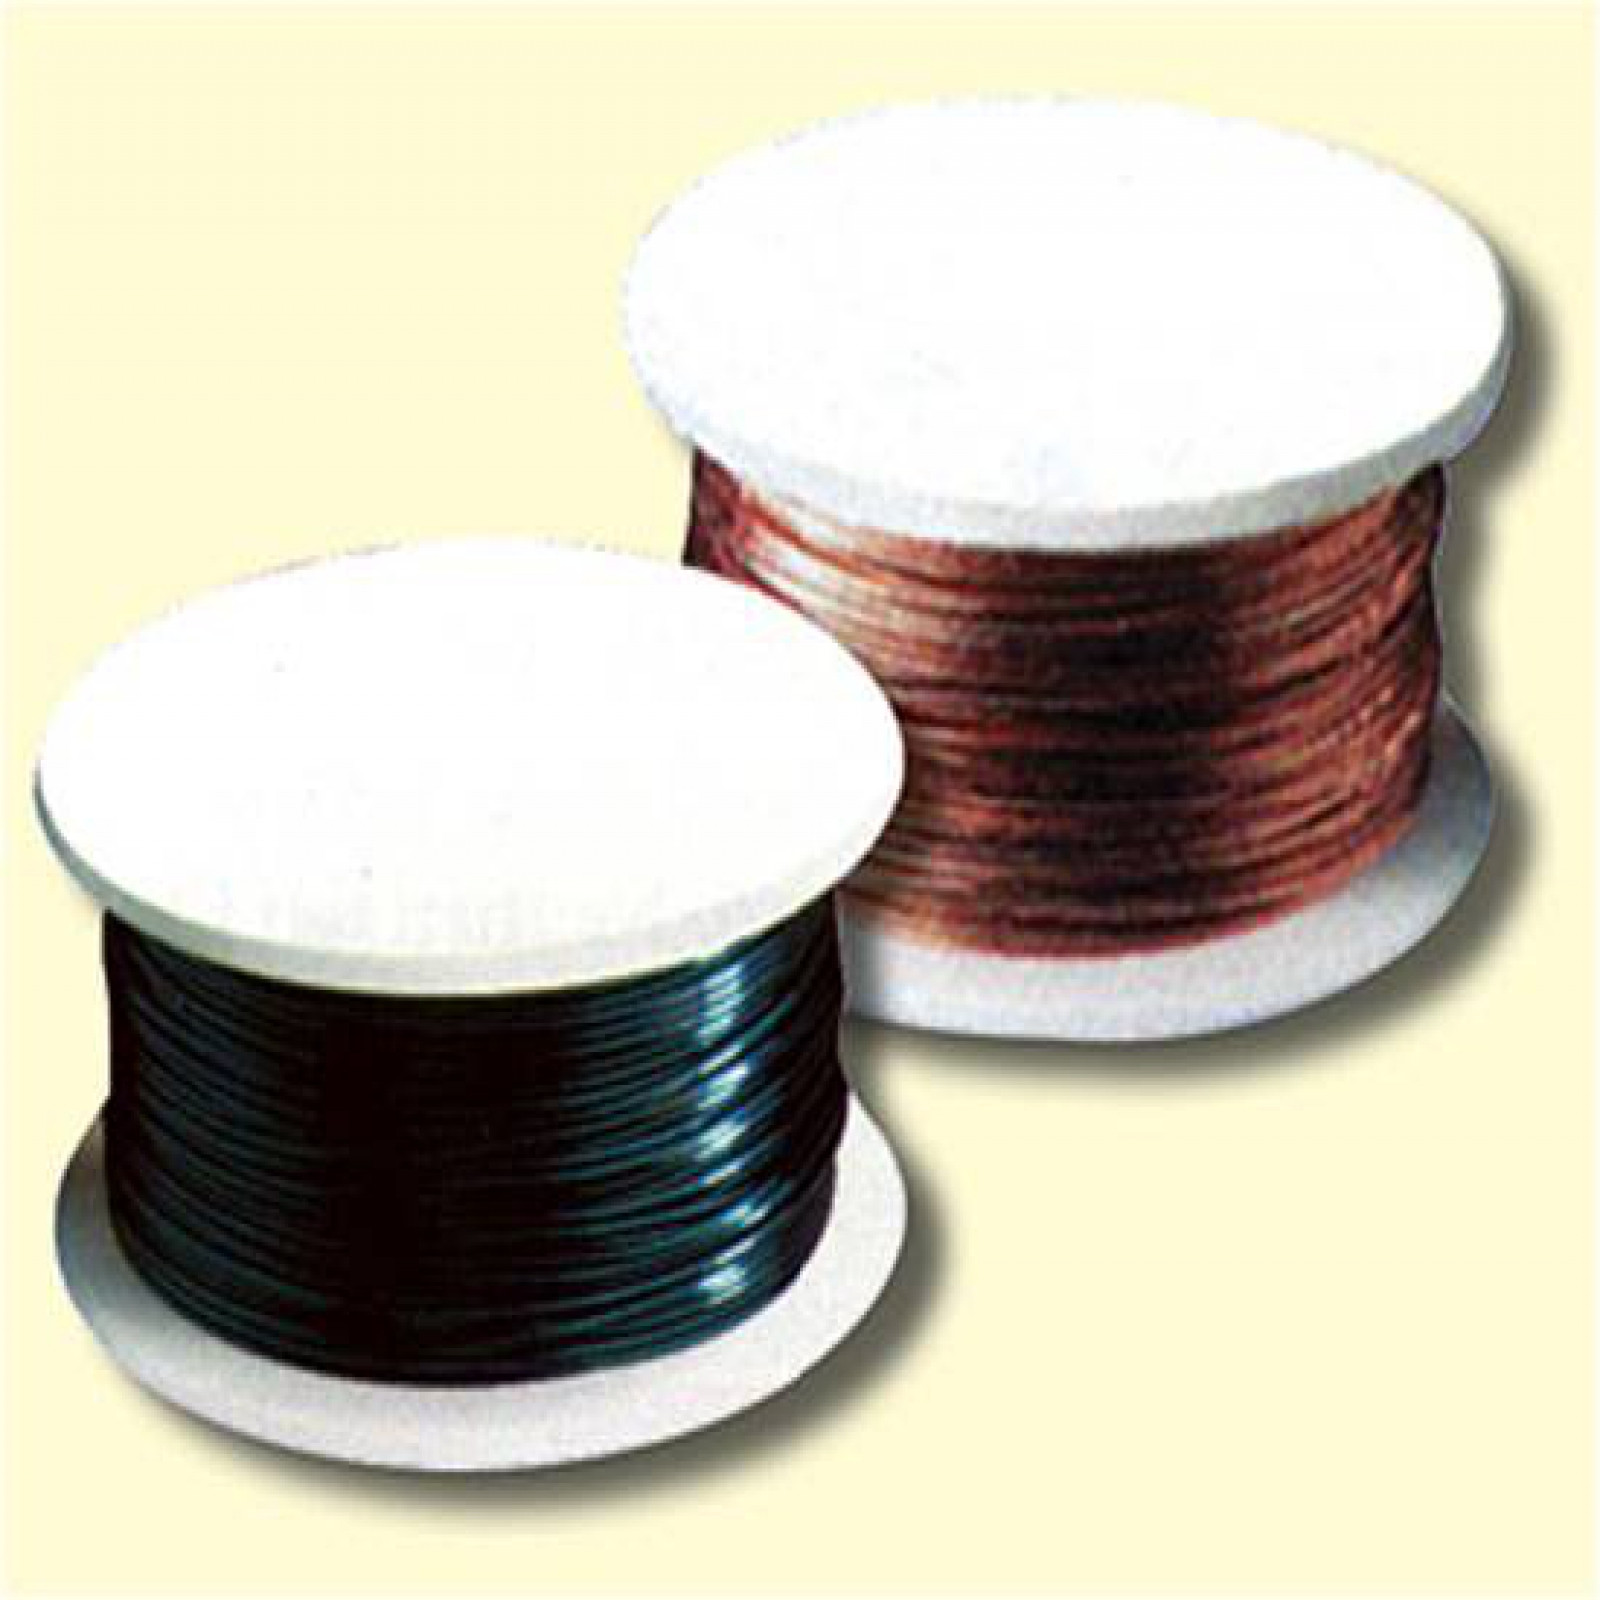 COLORED WIRE SPOOL - BLACK - DIA. 20 GAUGE - 15 YD